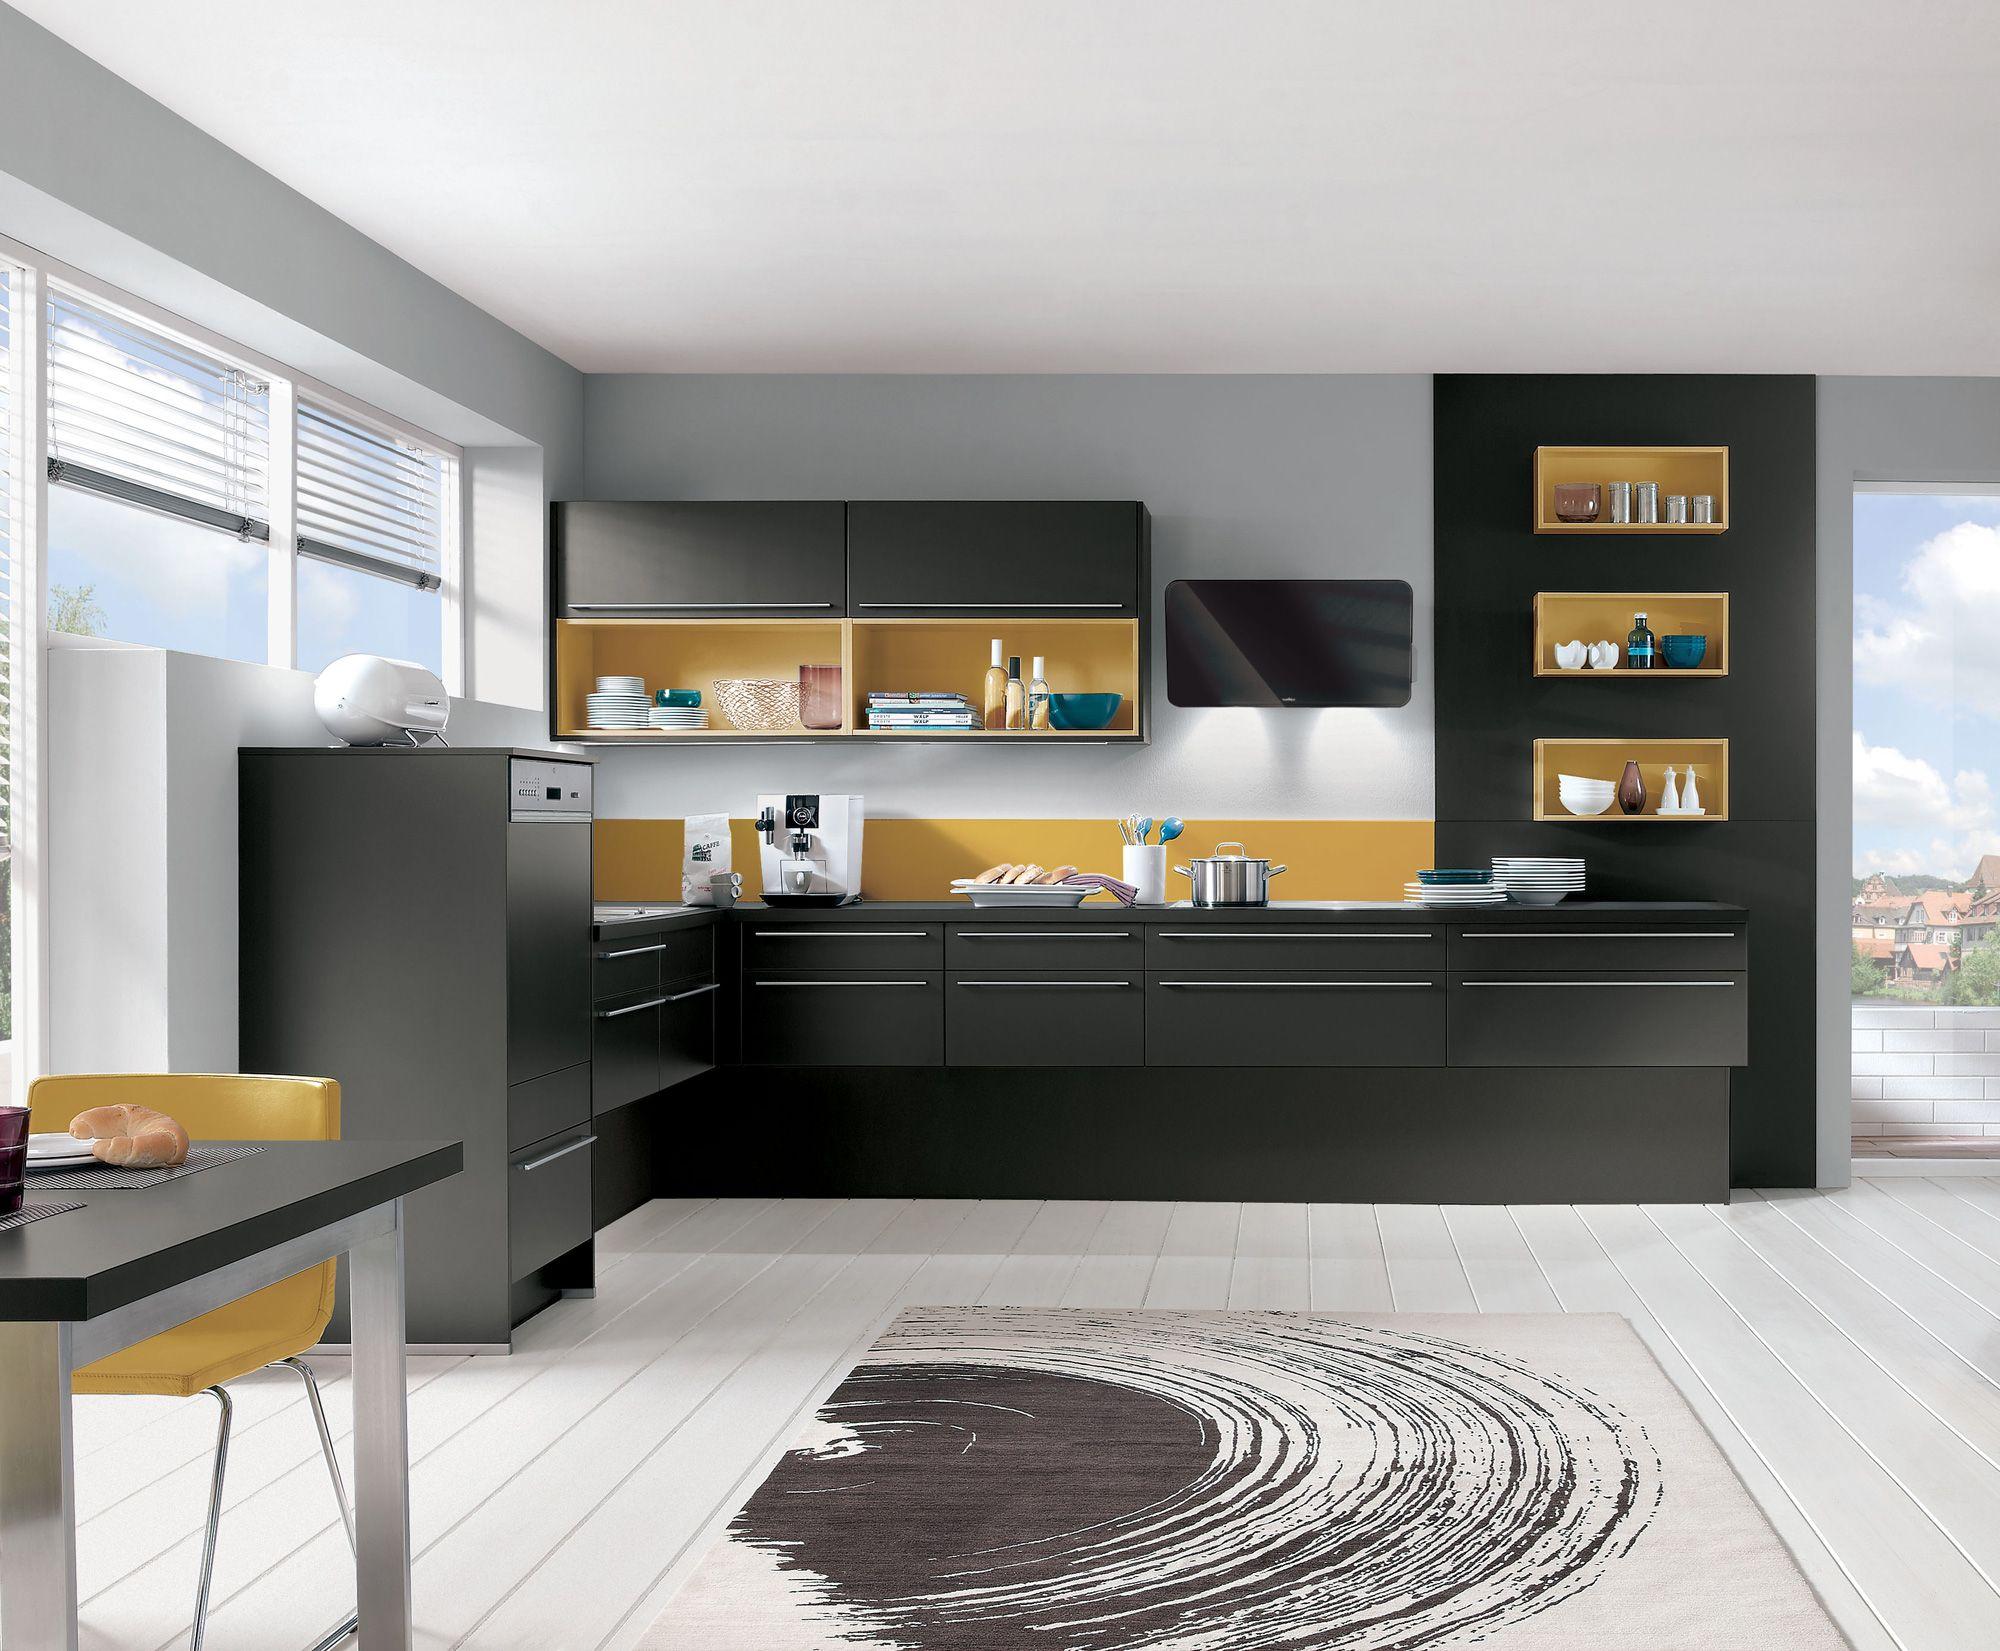 cuisine quip e aviva diana terra noir et niches curry 4 690 avec le pack beko 699 k k. Black Bedroom Furniture Sets. Home Design Ideas